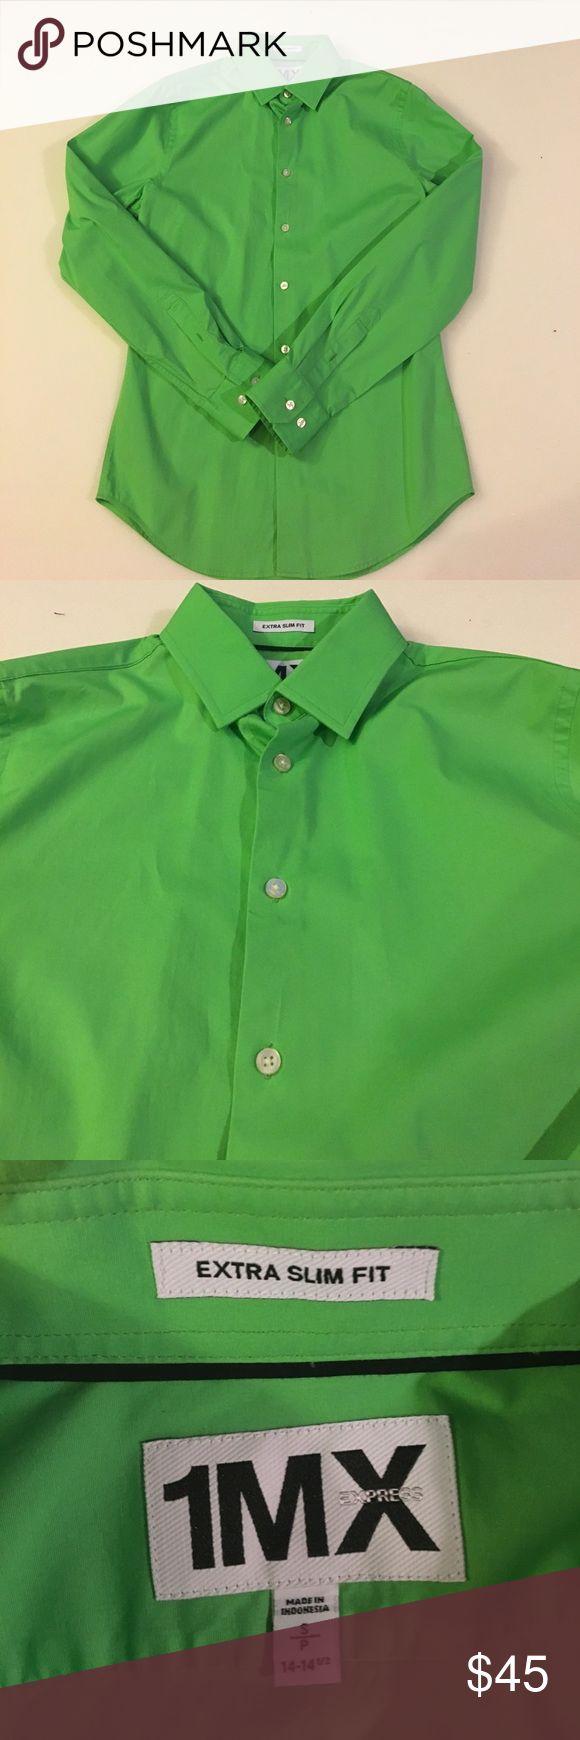 Men's Slim Fit Dress Shirt Men's Dress Shirt. Slim Fit. Green S Worn once for graduation. Great Condition! Send me an offer! Express Shirts Dress Shirts